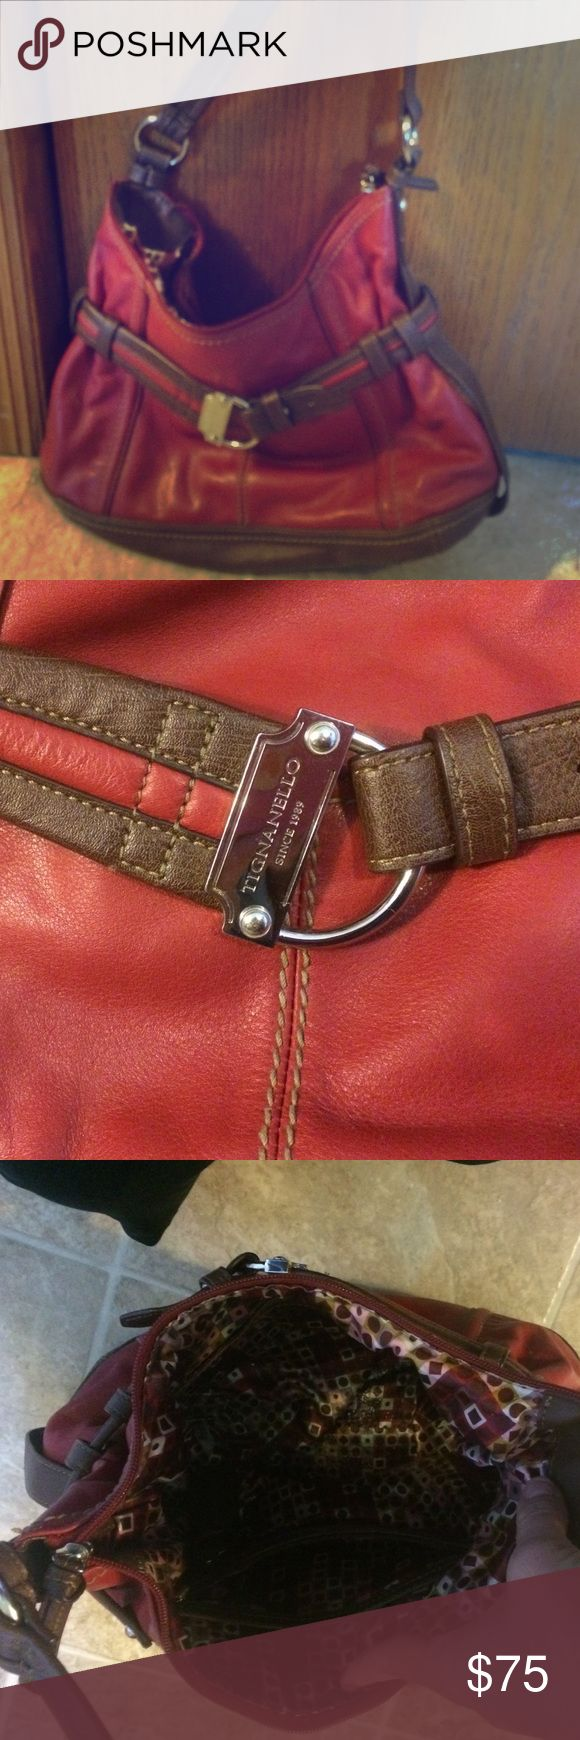 Tignanello Handbag Rarely used beautiful 100% genuine leather handbag. Tignanello Bags Satchels